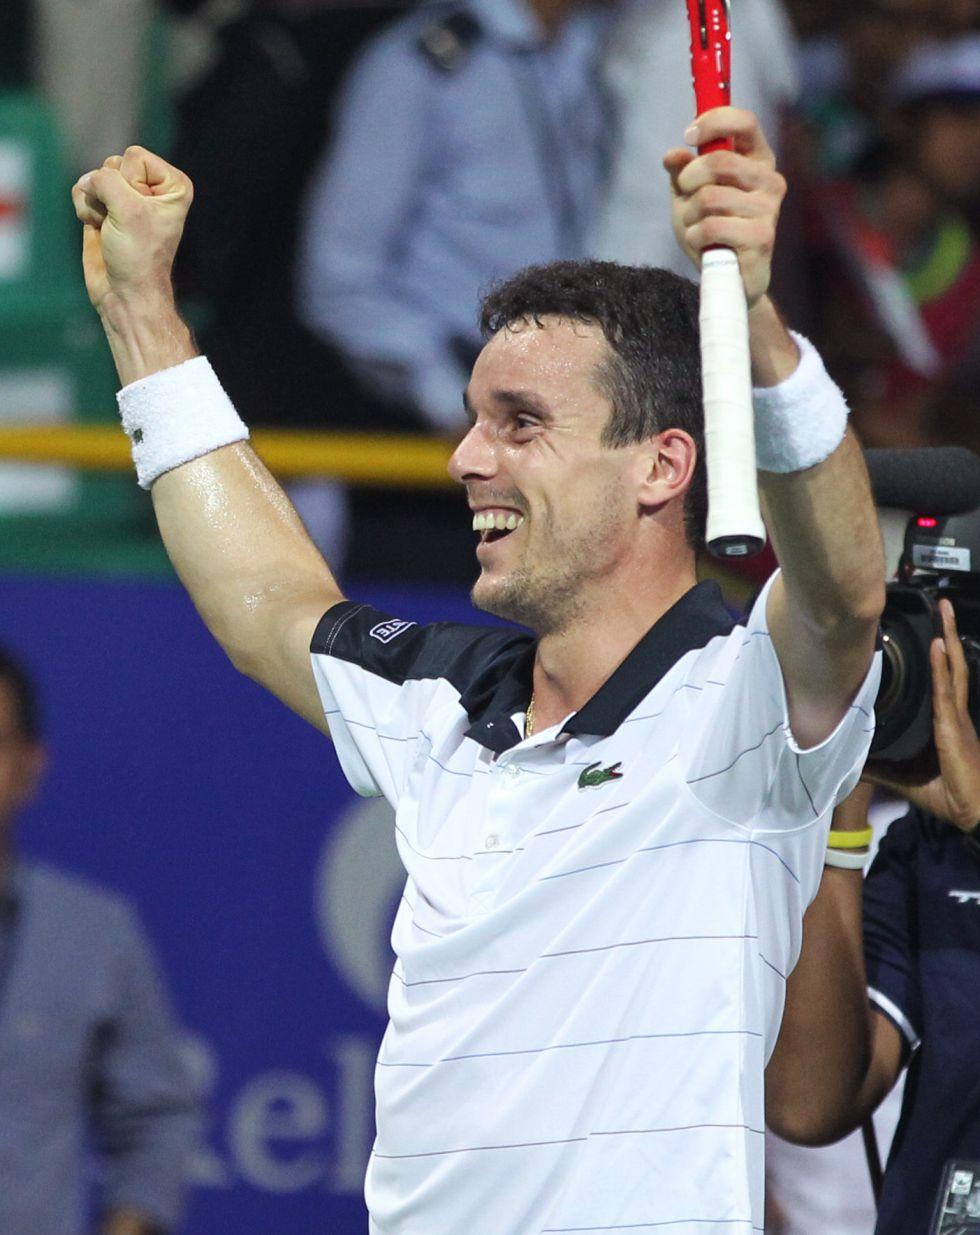 Roberto Bautista alcanza la final en Chennai: le espera Tipsarevic